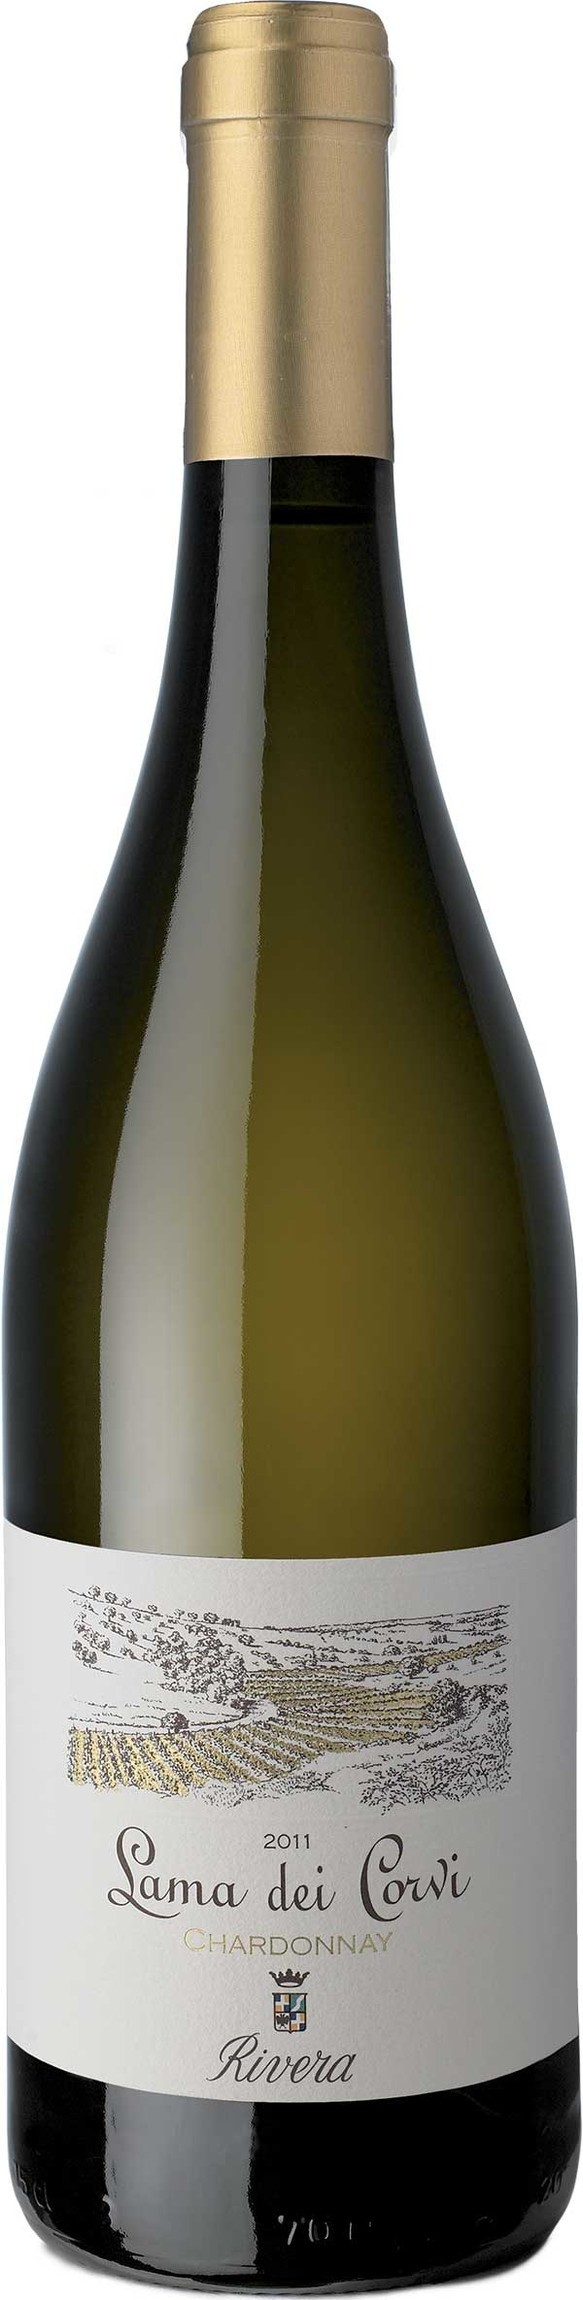 Rivera 'Lama dei Corvi' Chardonnay